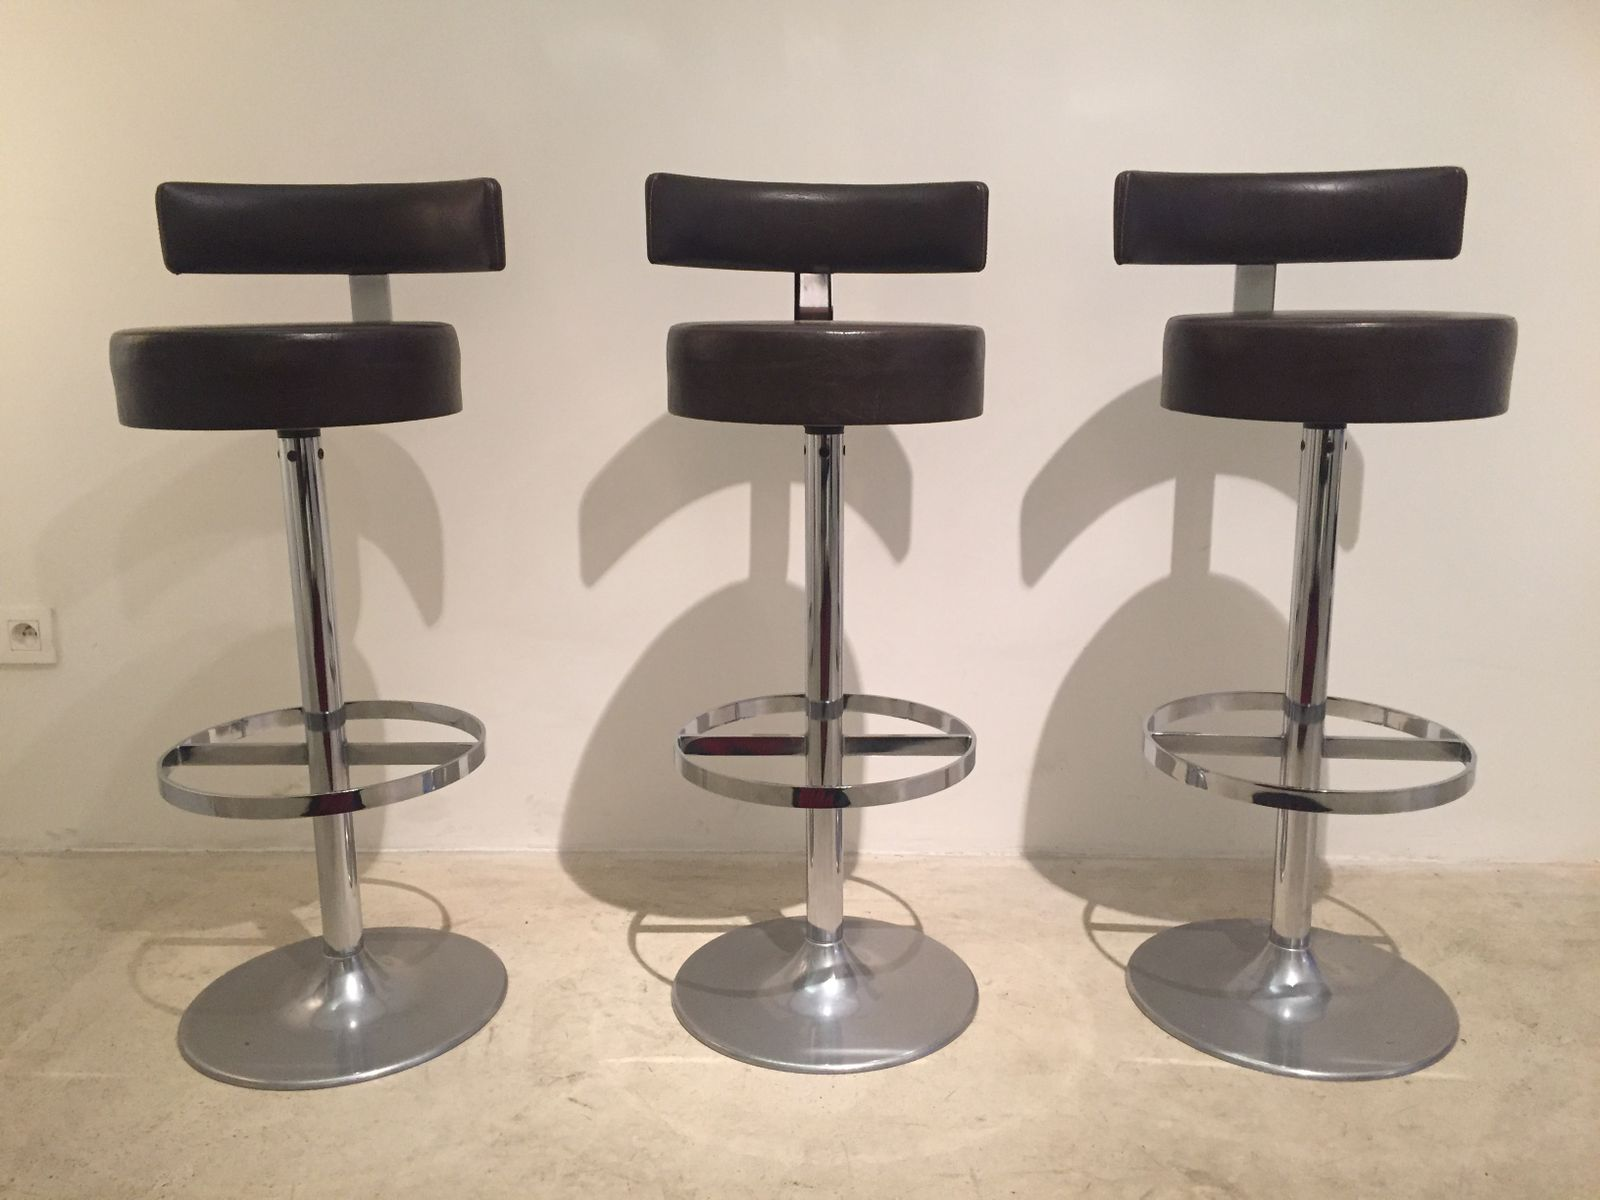 chromed swivel tulip bar stools 1960s set of 3 for sale at pamono. Black Bedroom Furniture Sets. Home Design Ideas